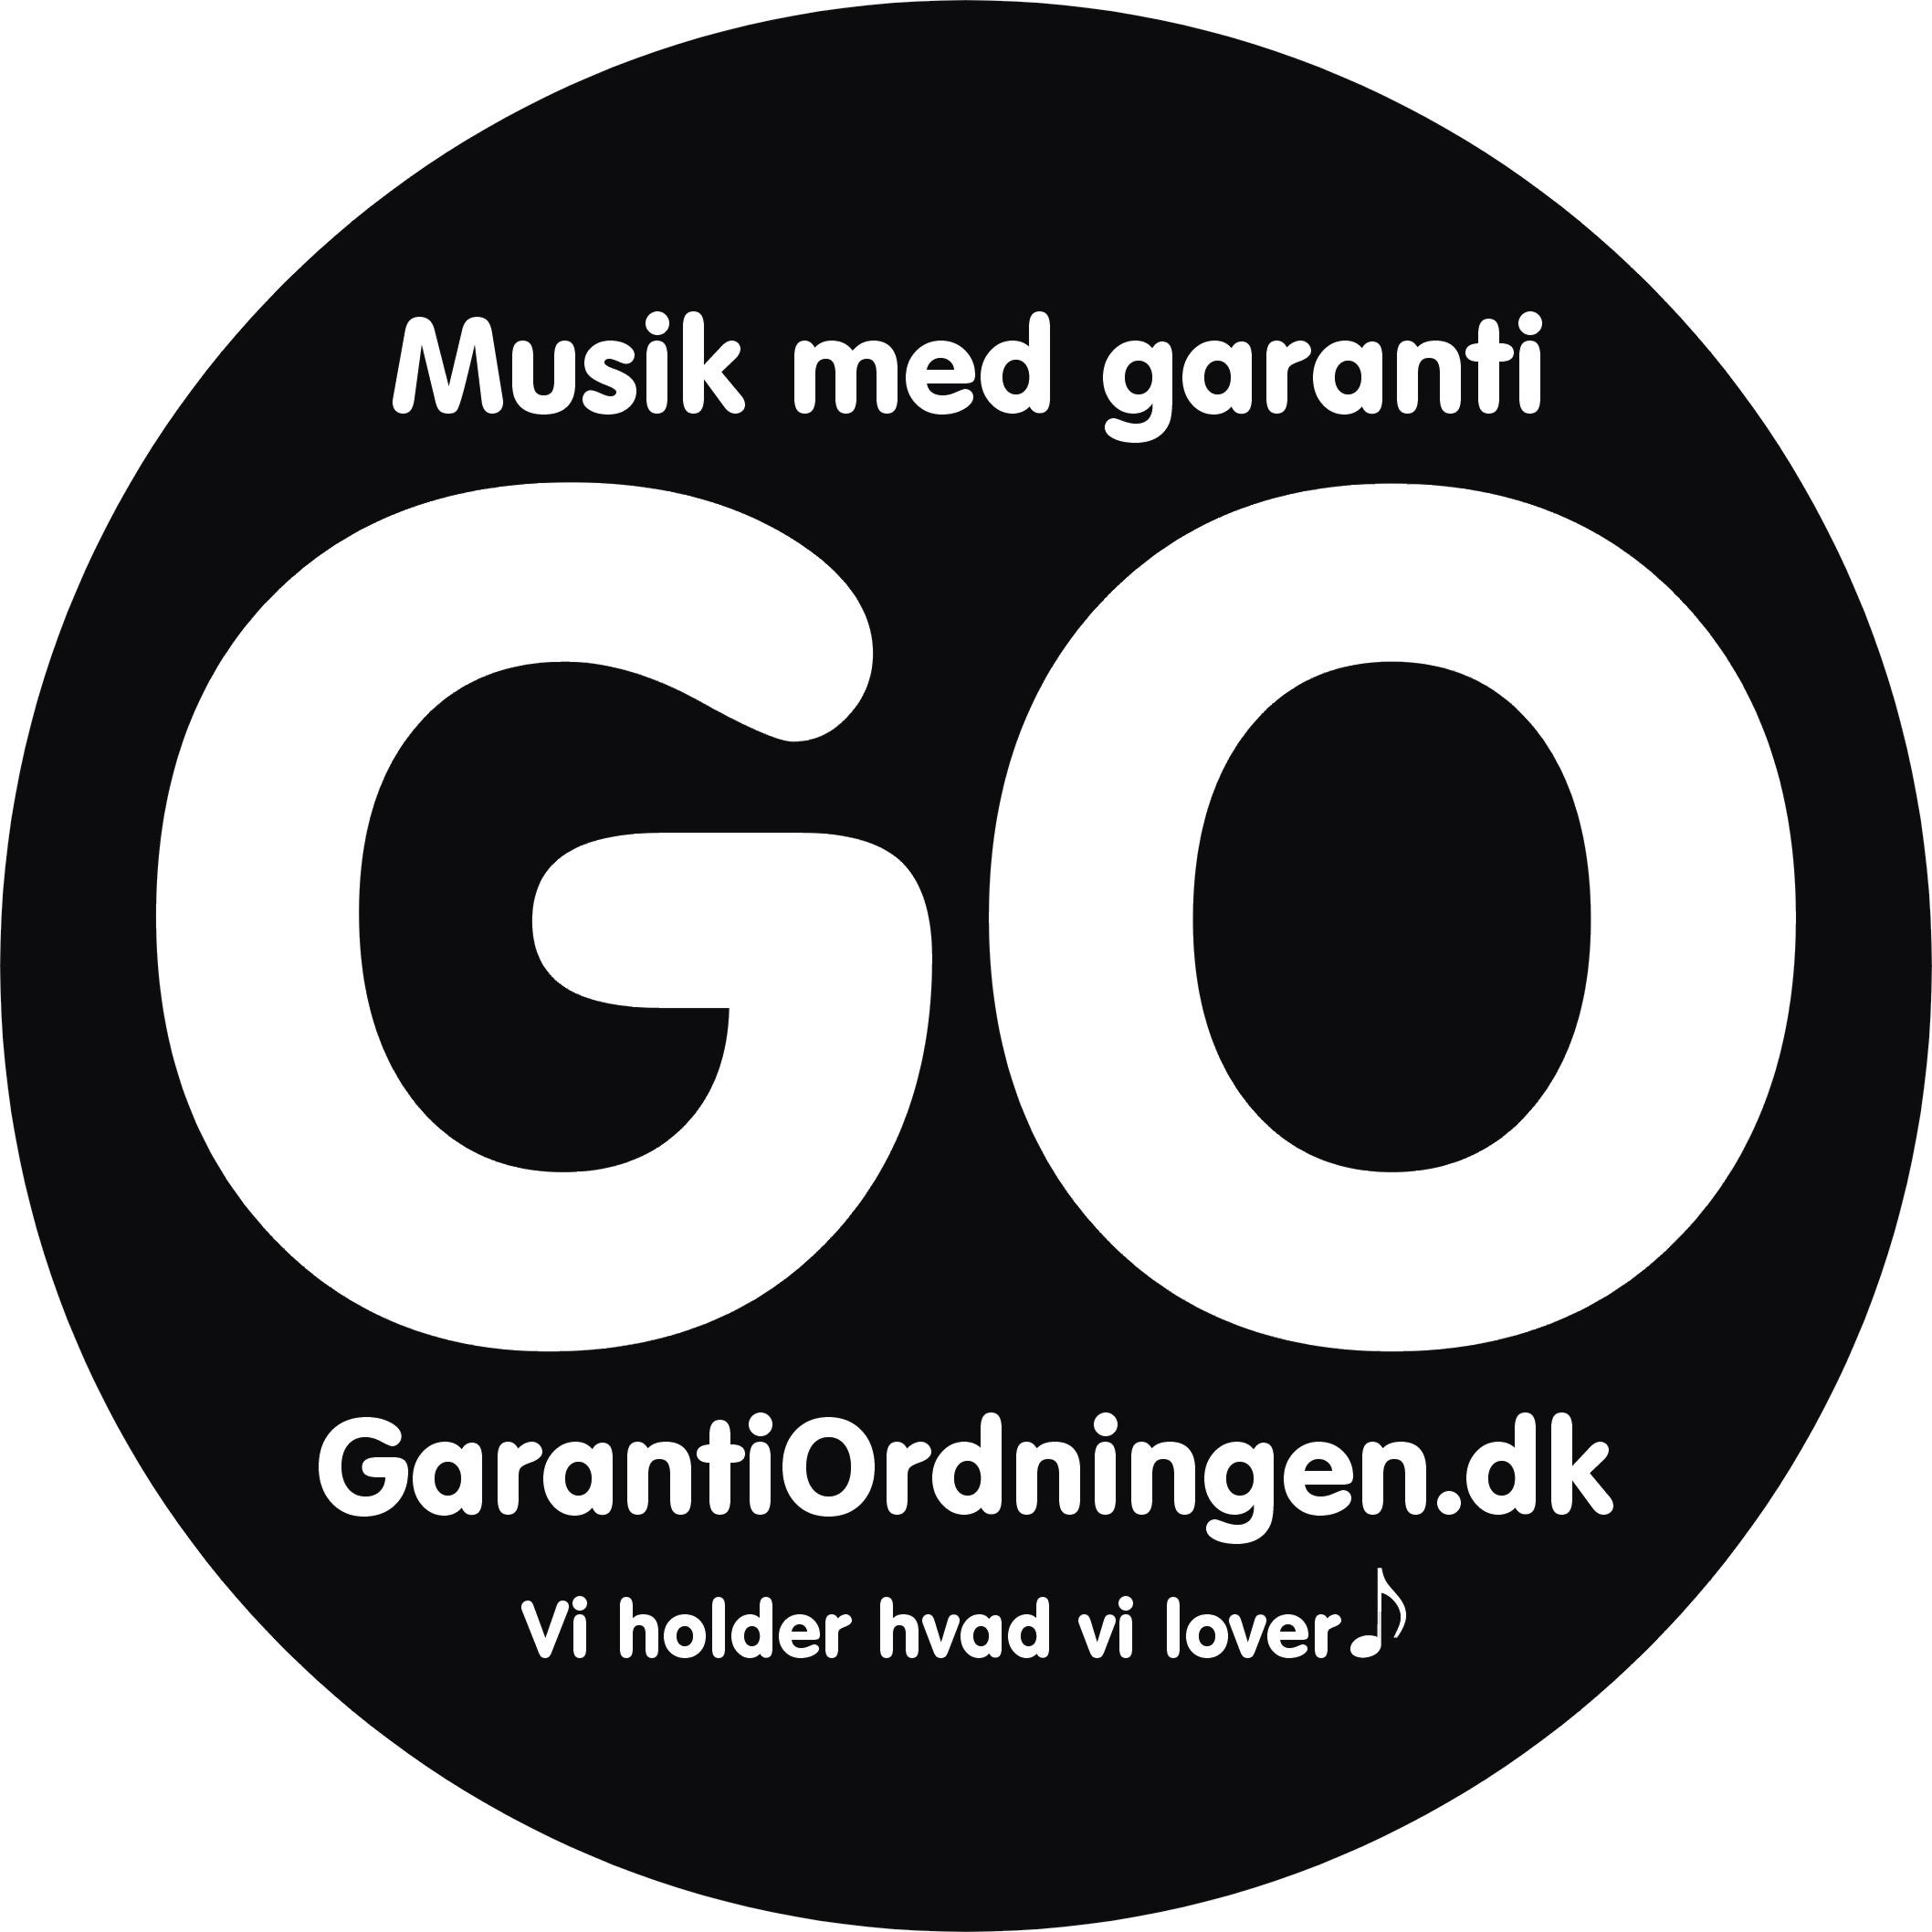 Garantiordningen.dk